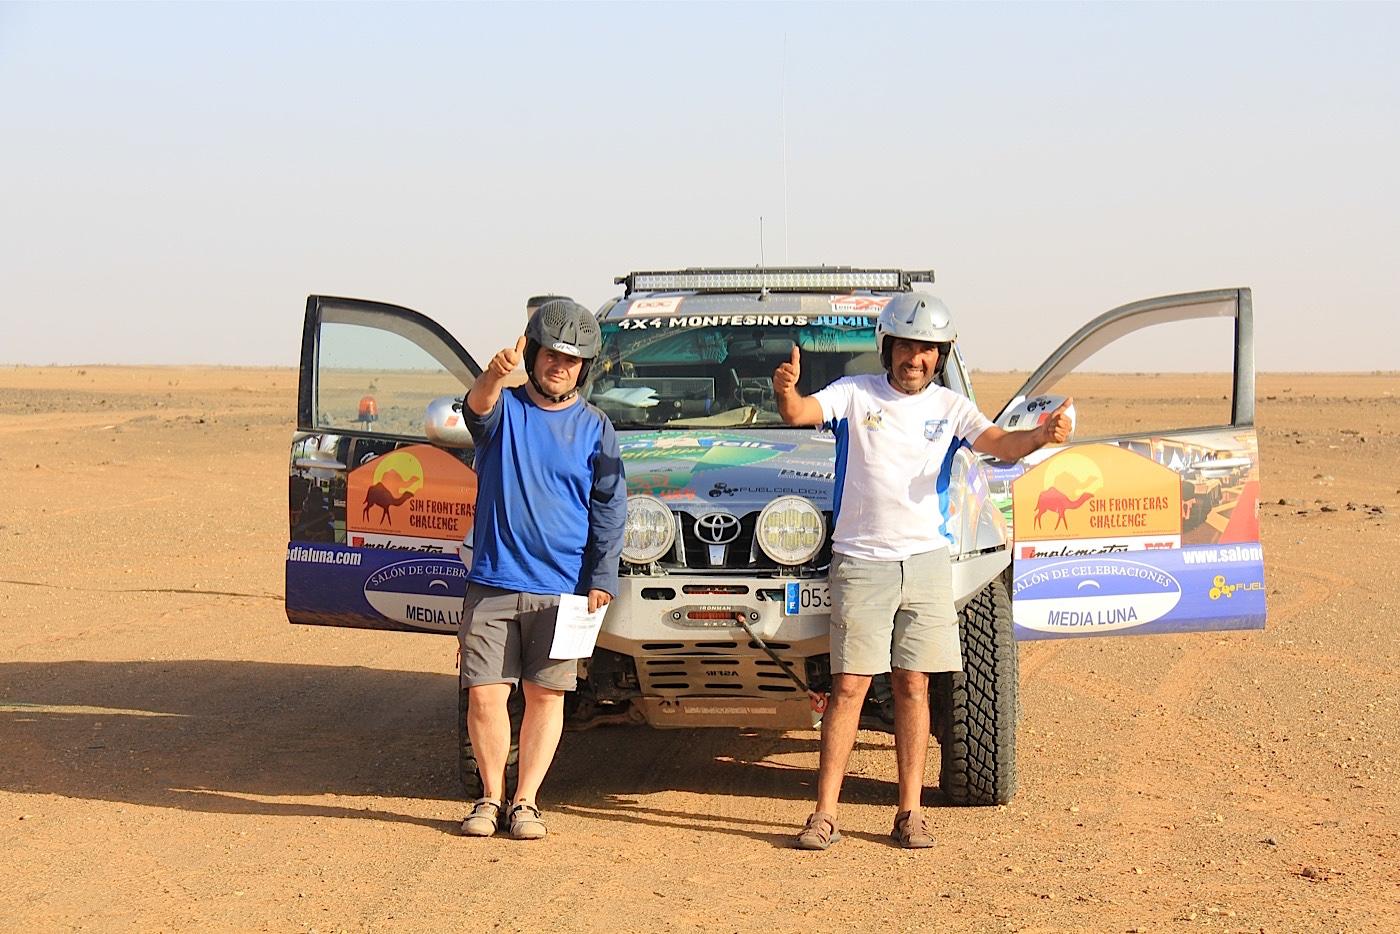 Sin fronteras challenge rally raid proam 2016 for Oficina turismo marruecos